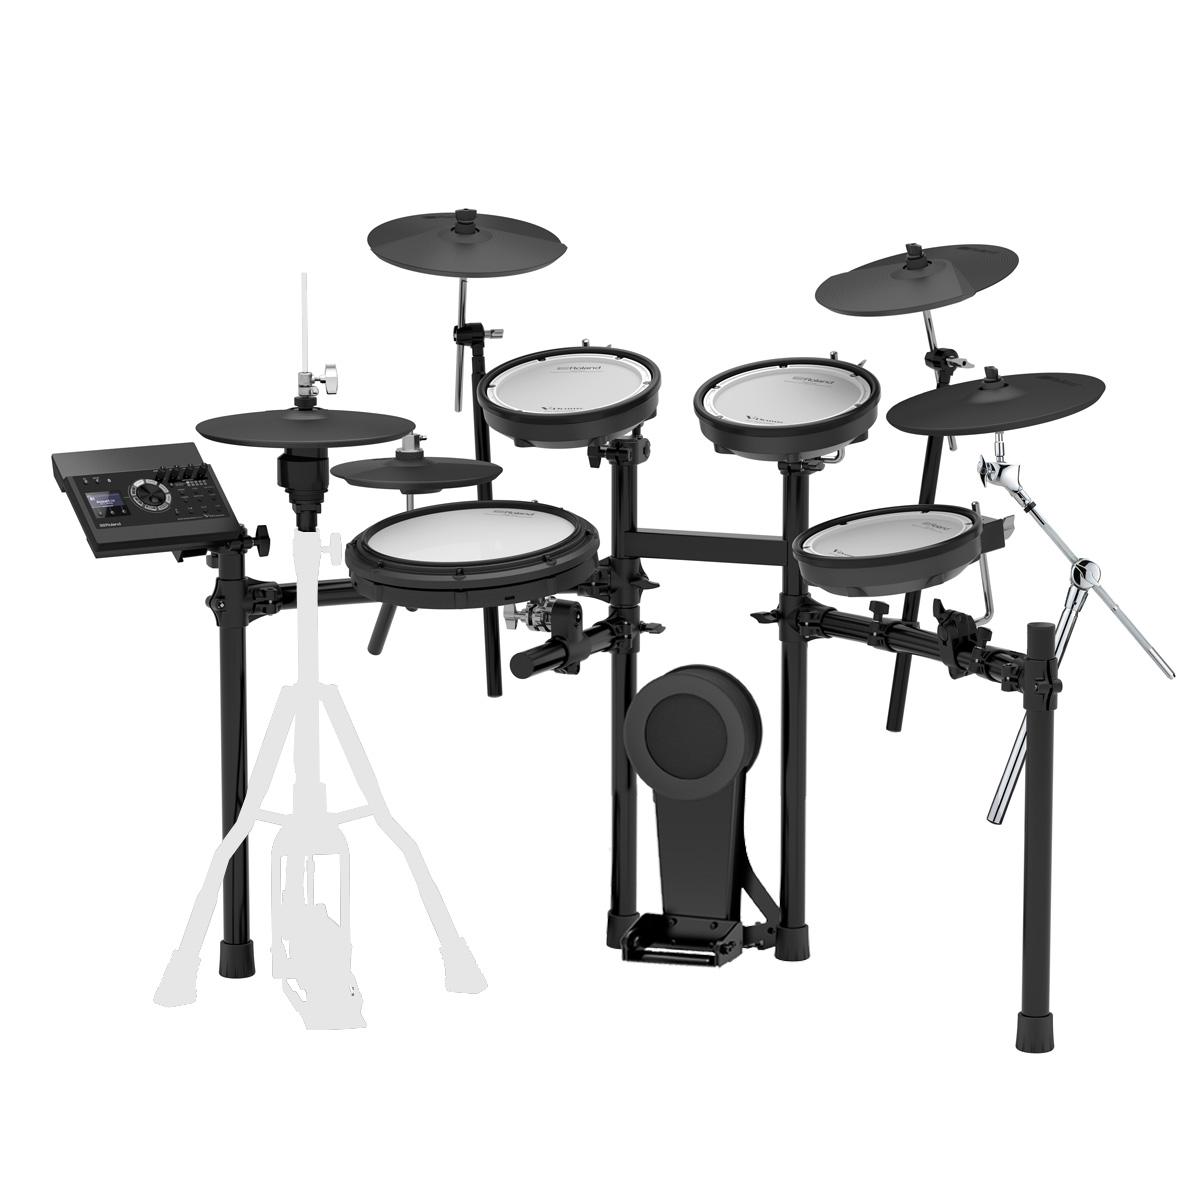 Roland 電子ドラム TD-17KV-S カスタム Expanded Set VH-10/CY-13R 4シンバル キット【YRK】